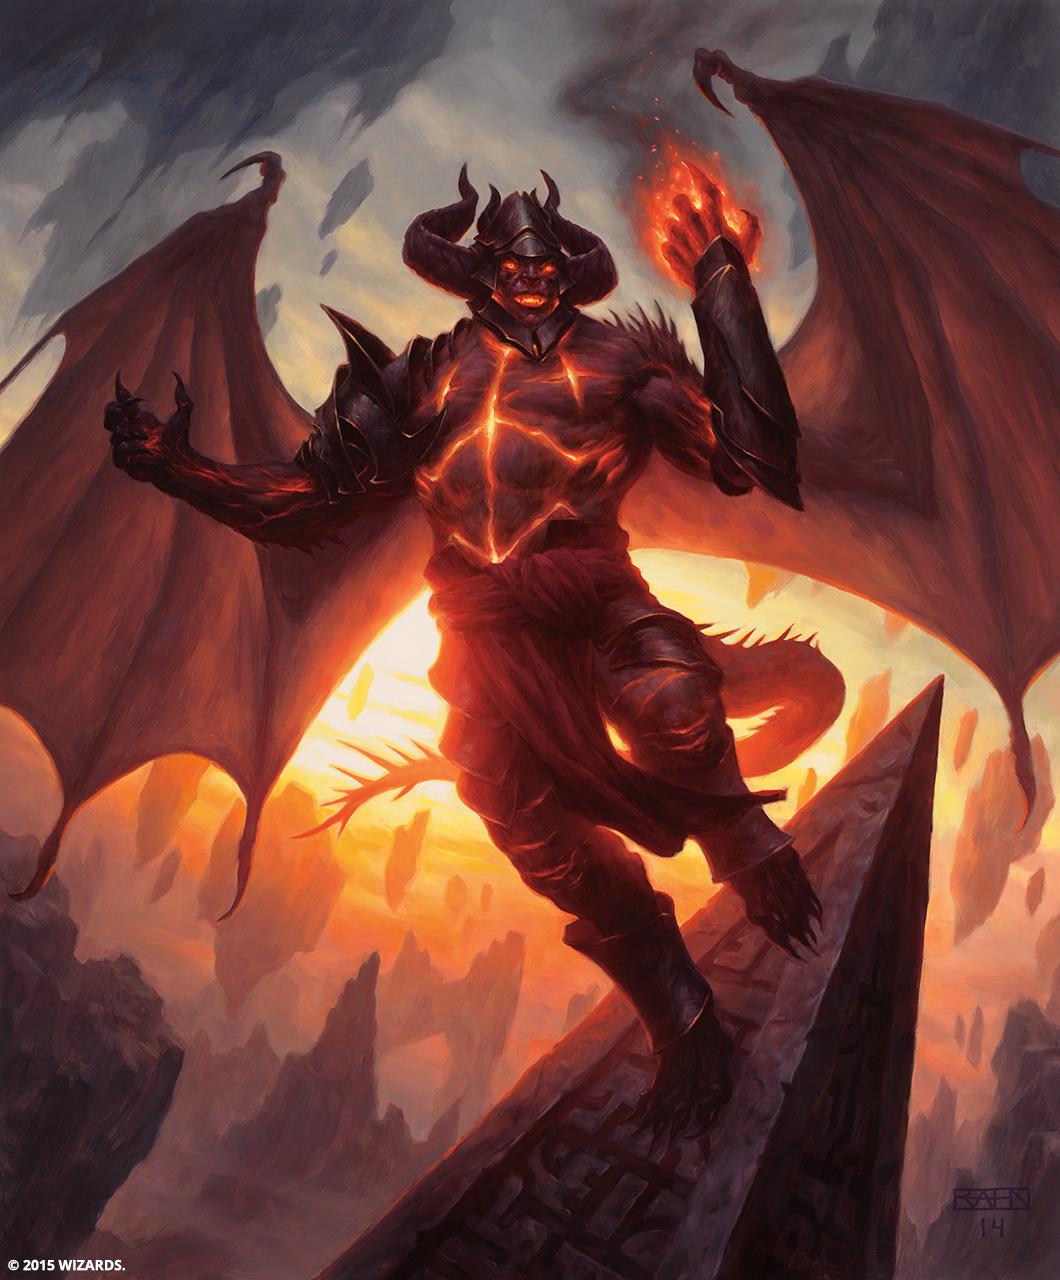 Lord Argonath, The Blackblade A8c0ec744861078a0c31e0d715117170